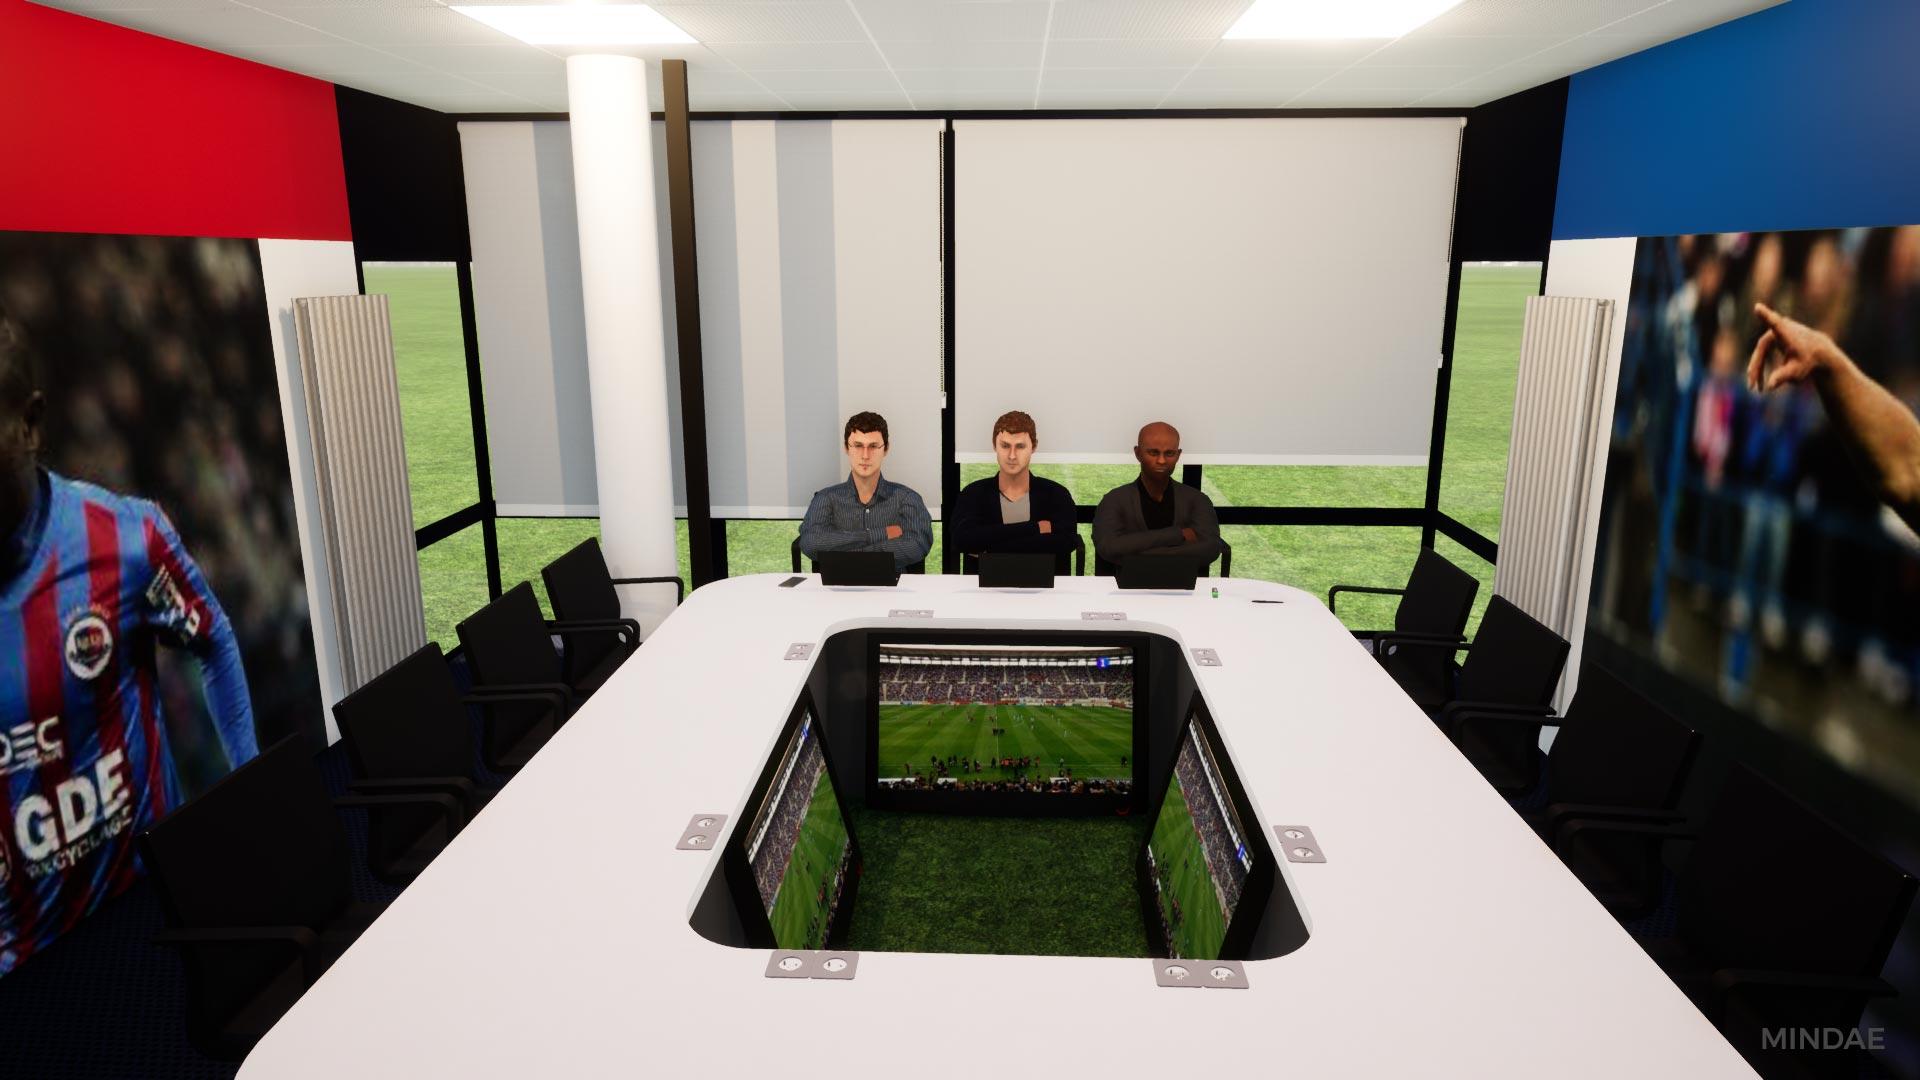 Mindae_3D_stade_malherbe_acomj_bureau_reunion_projet_mobilier_sur_mesure_table_conference_caen-(2)